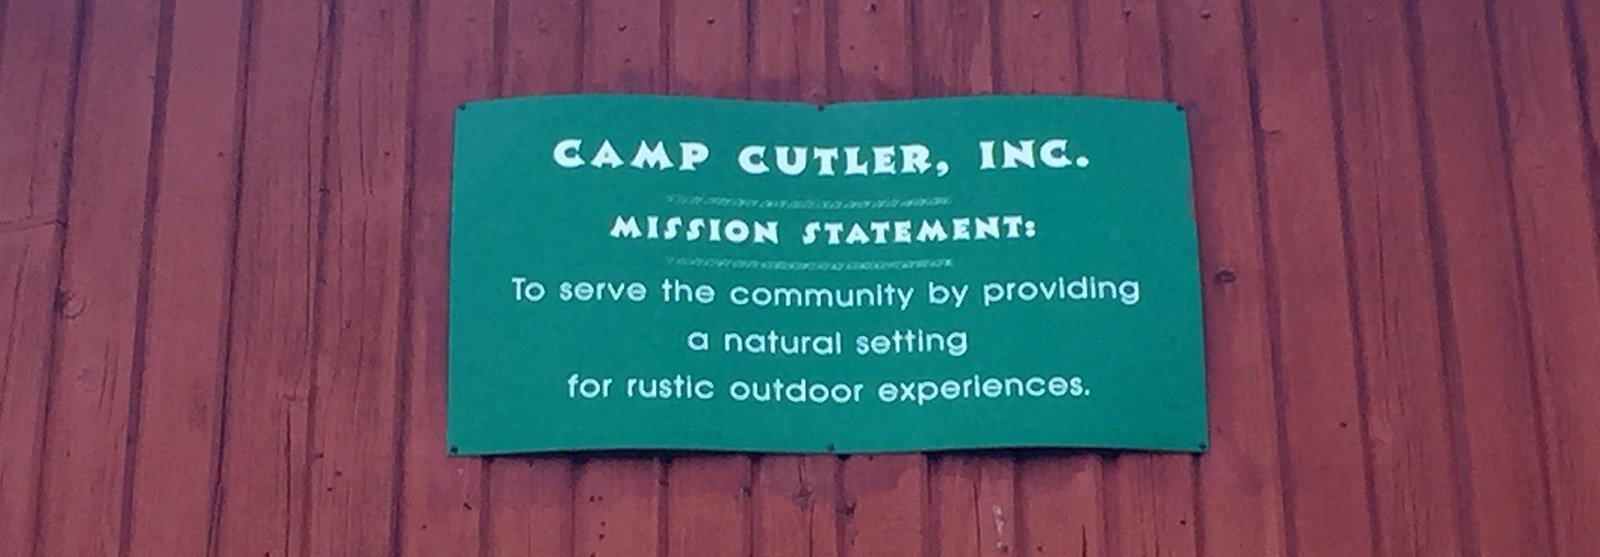 Camp Cutler Mission